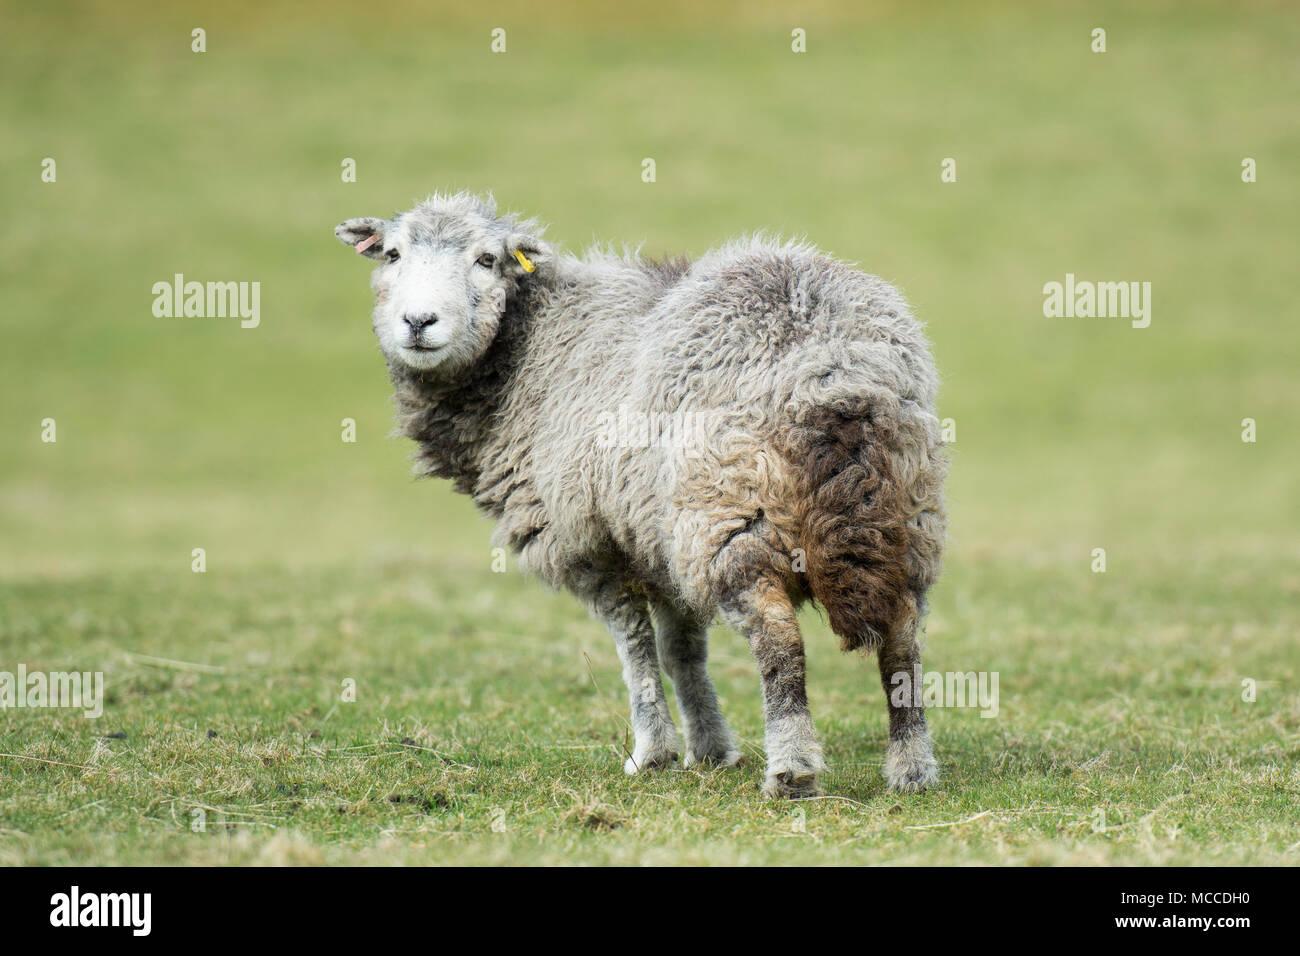 a herdwick sheep - Stock Image